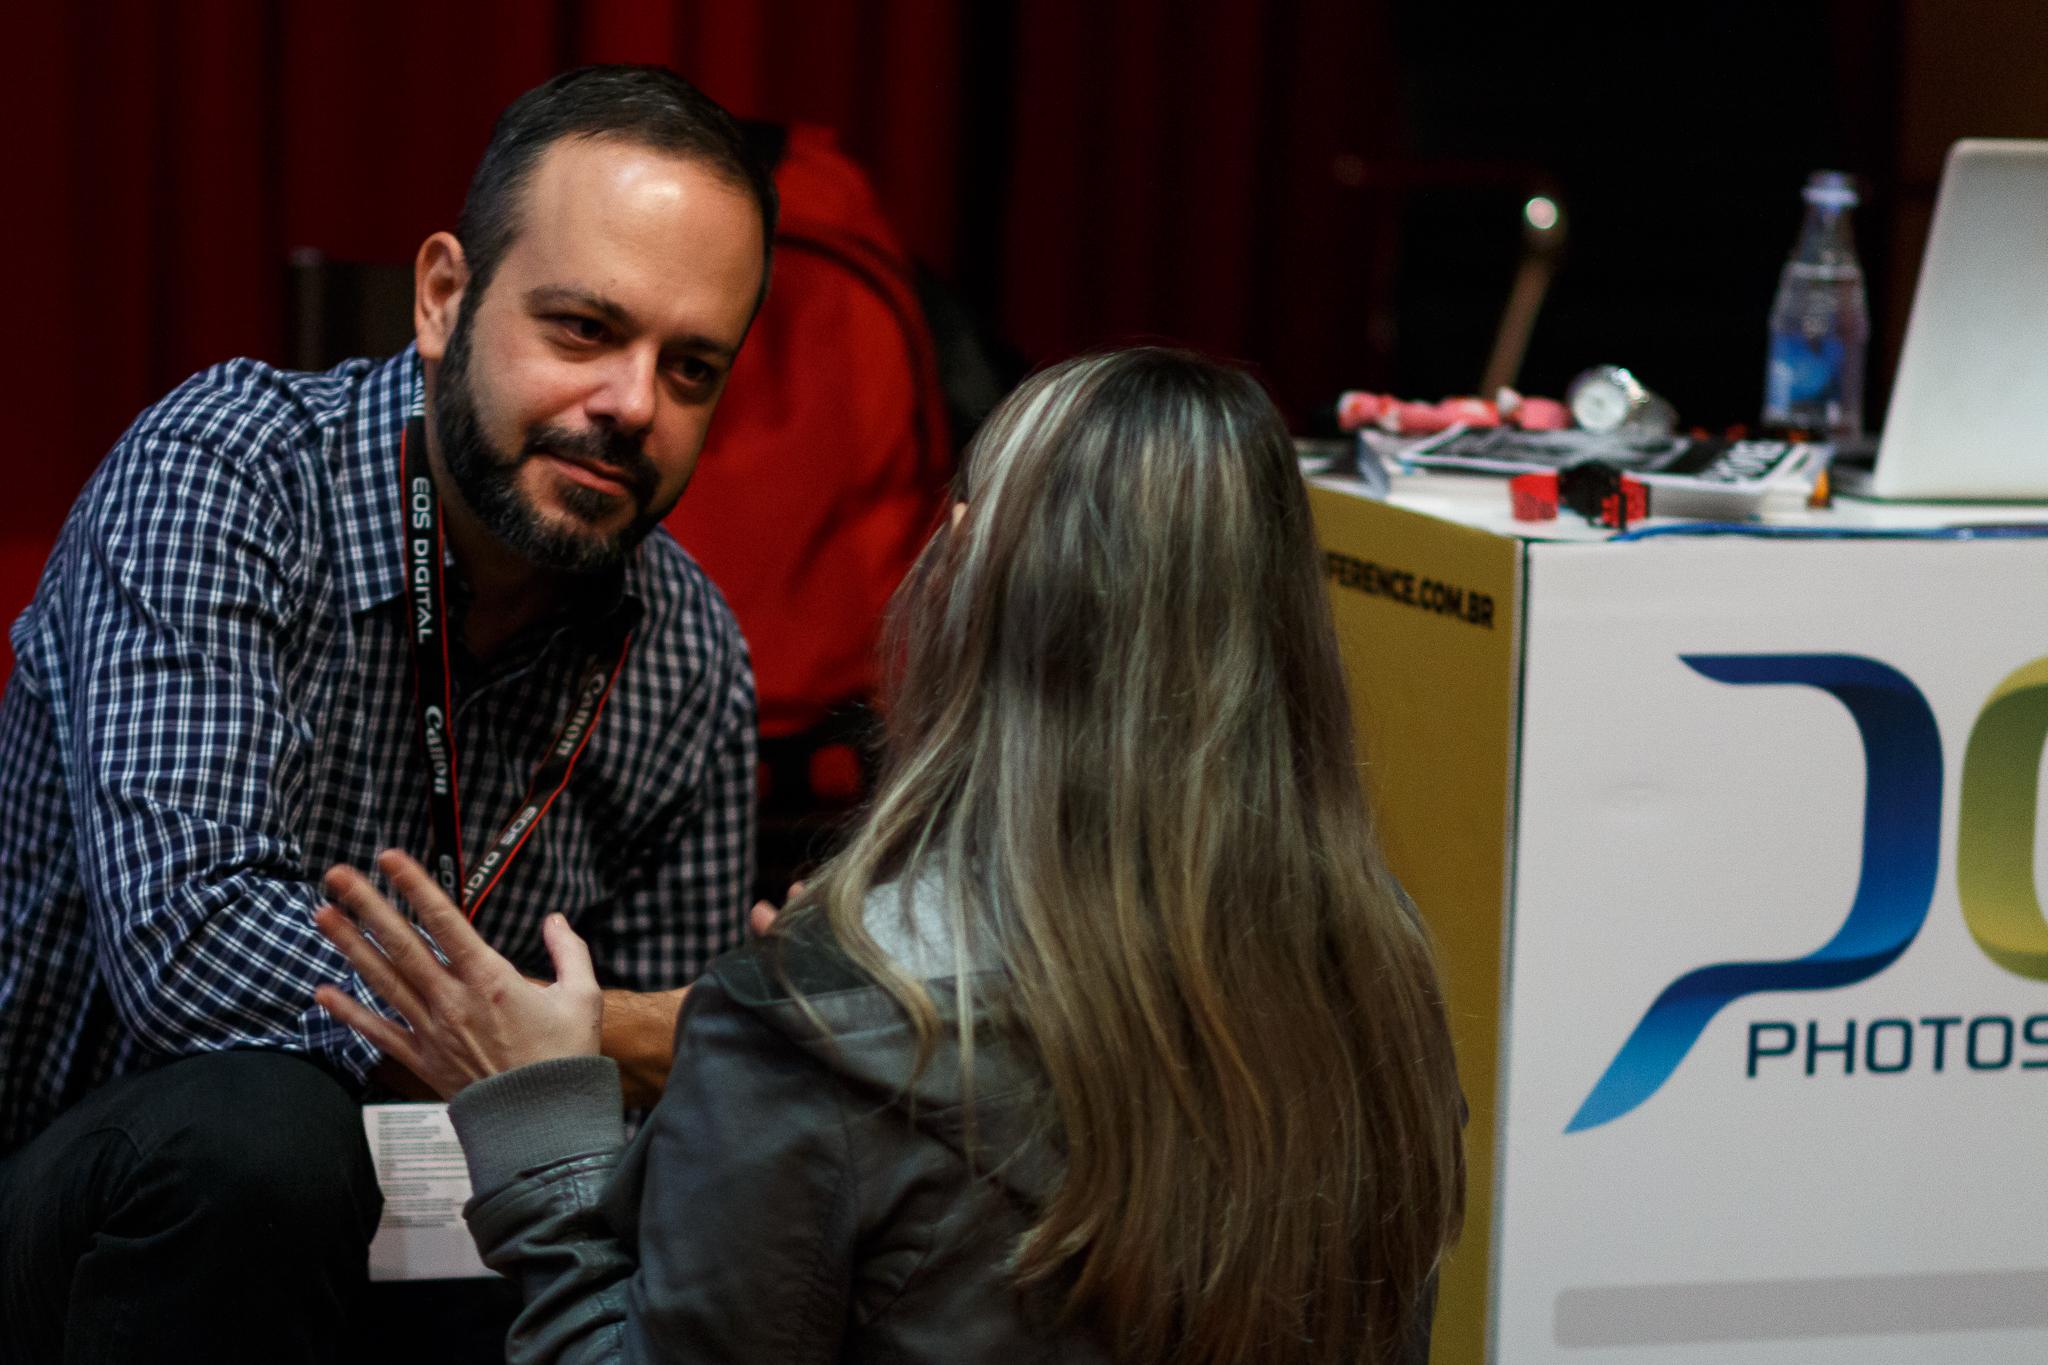 Photoshop Conference 2016 by Arnaldo Cellani Junior - 2016_05_18-10_07_56-0022